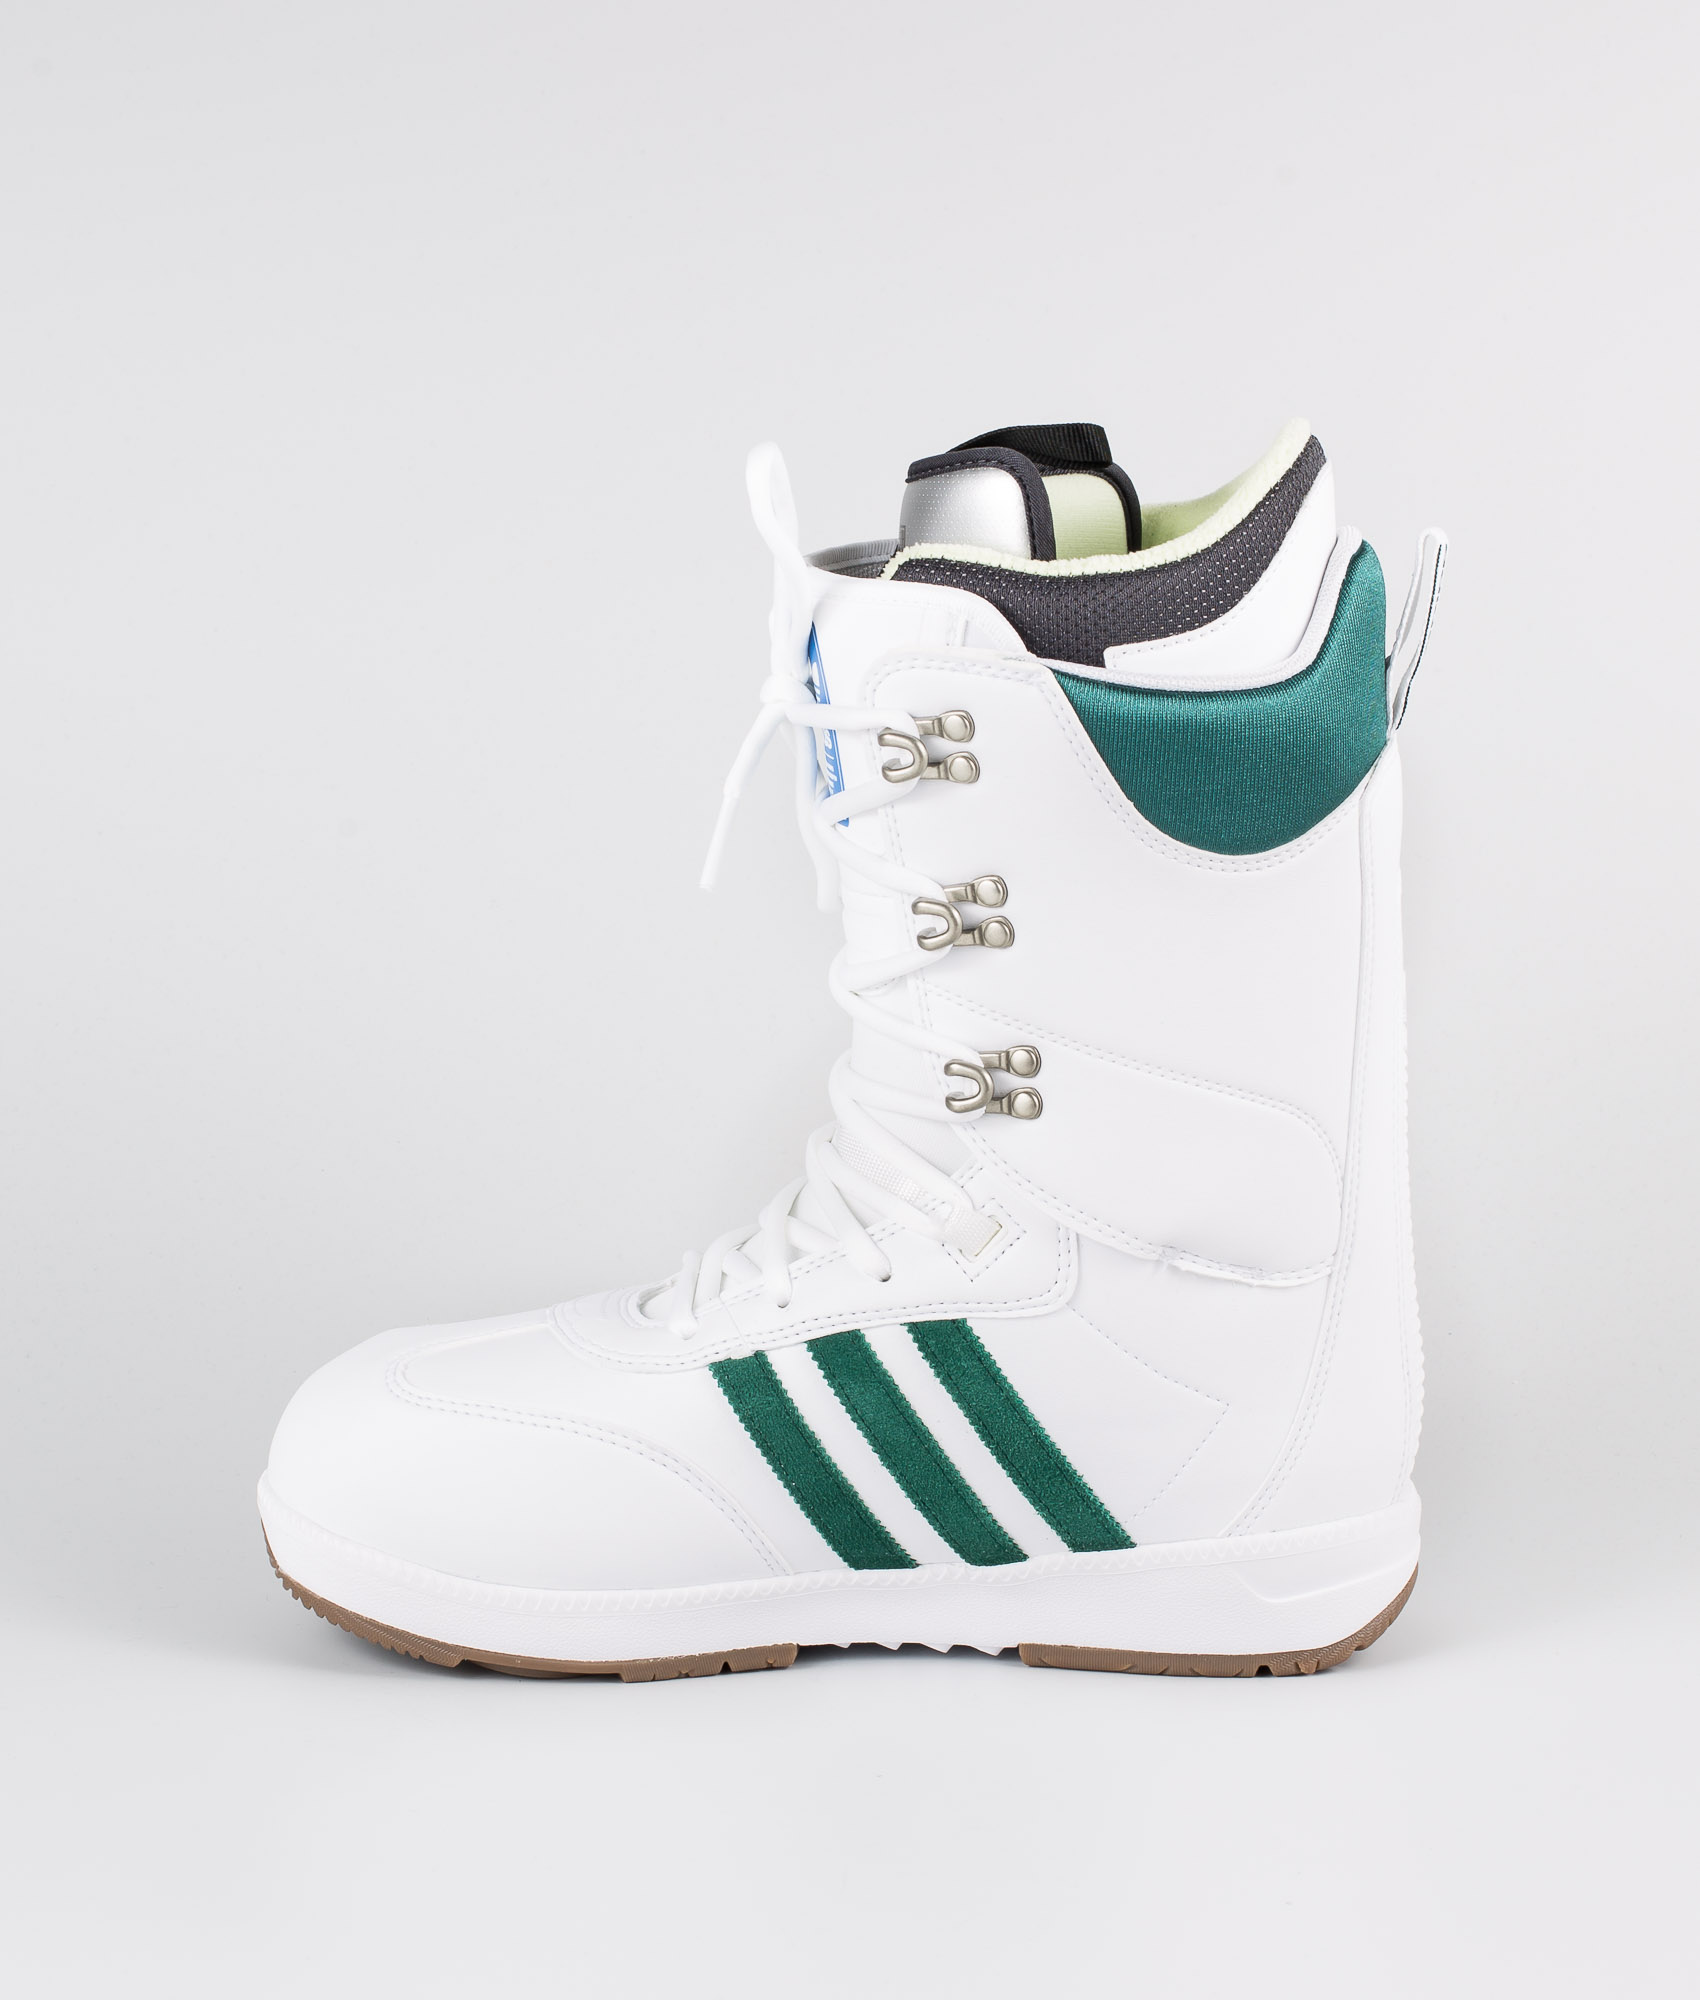 Adidas Snowboarding Samba Adv Boots Footwear WhiteCollegiate GreenGum5